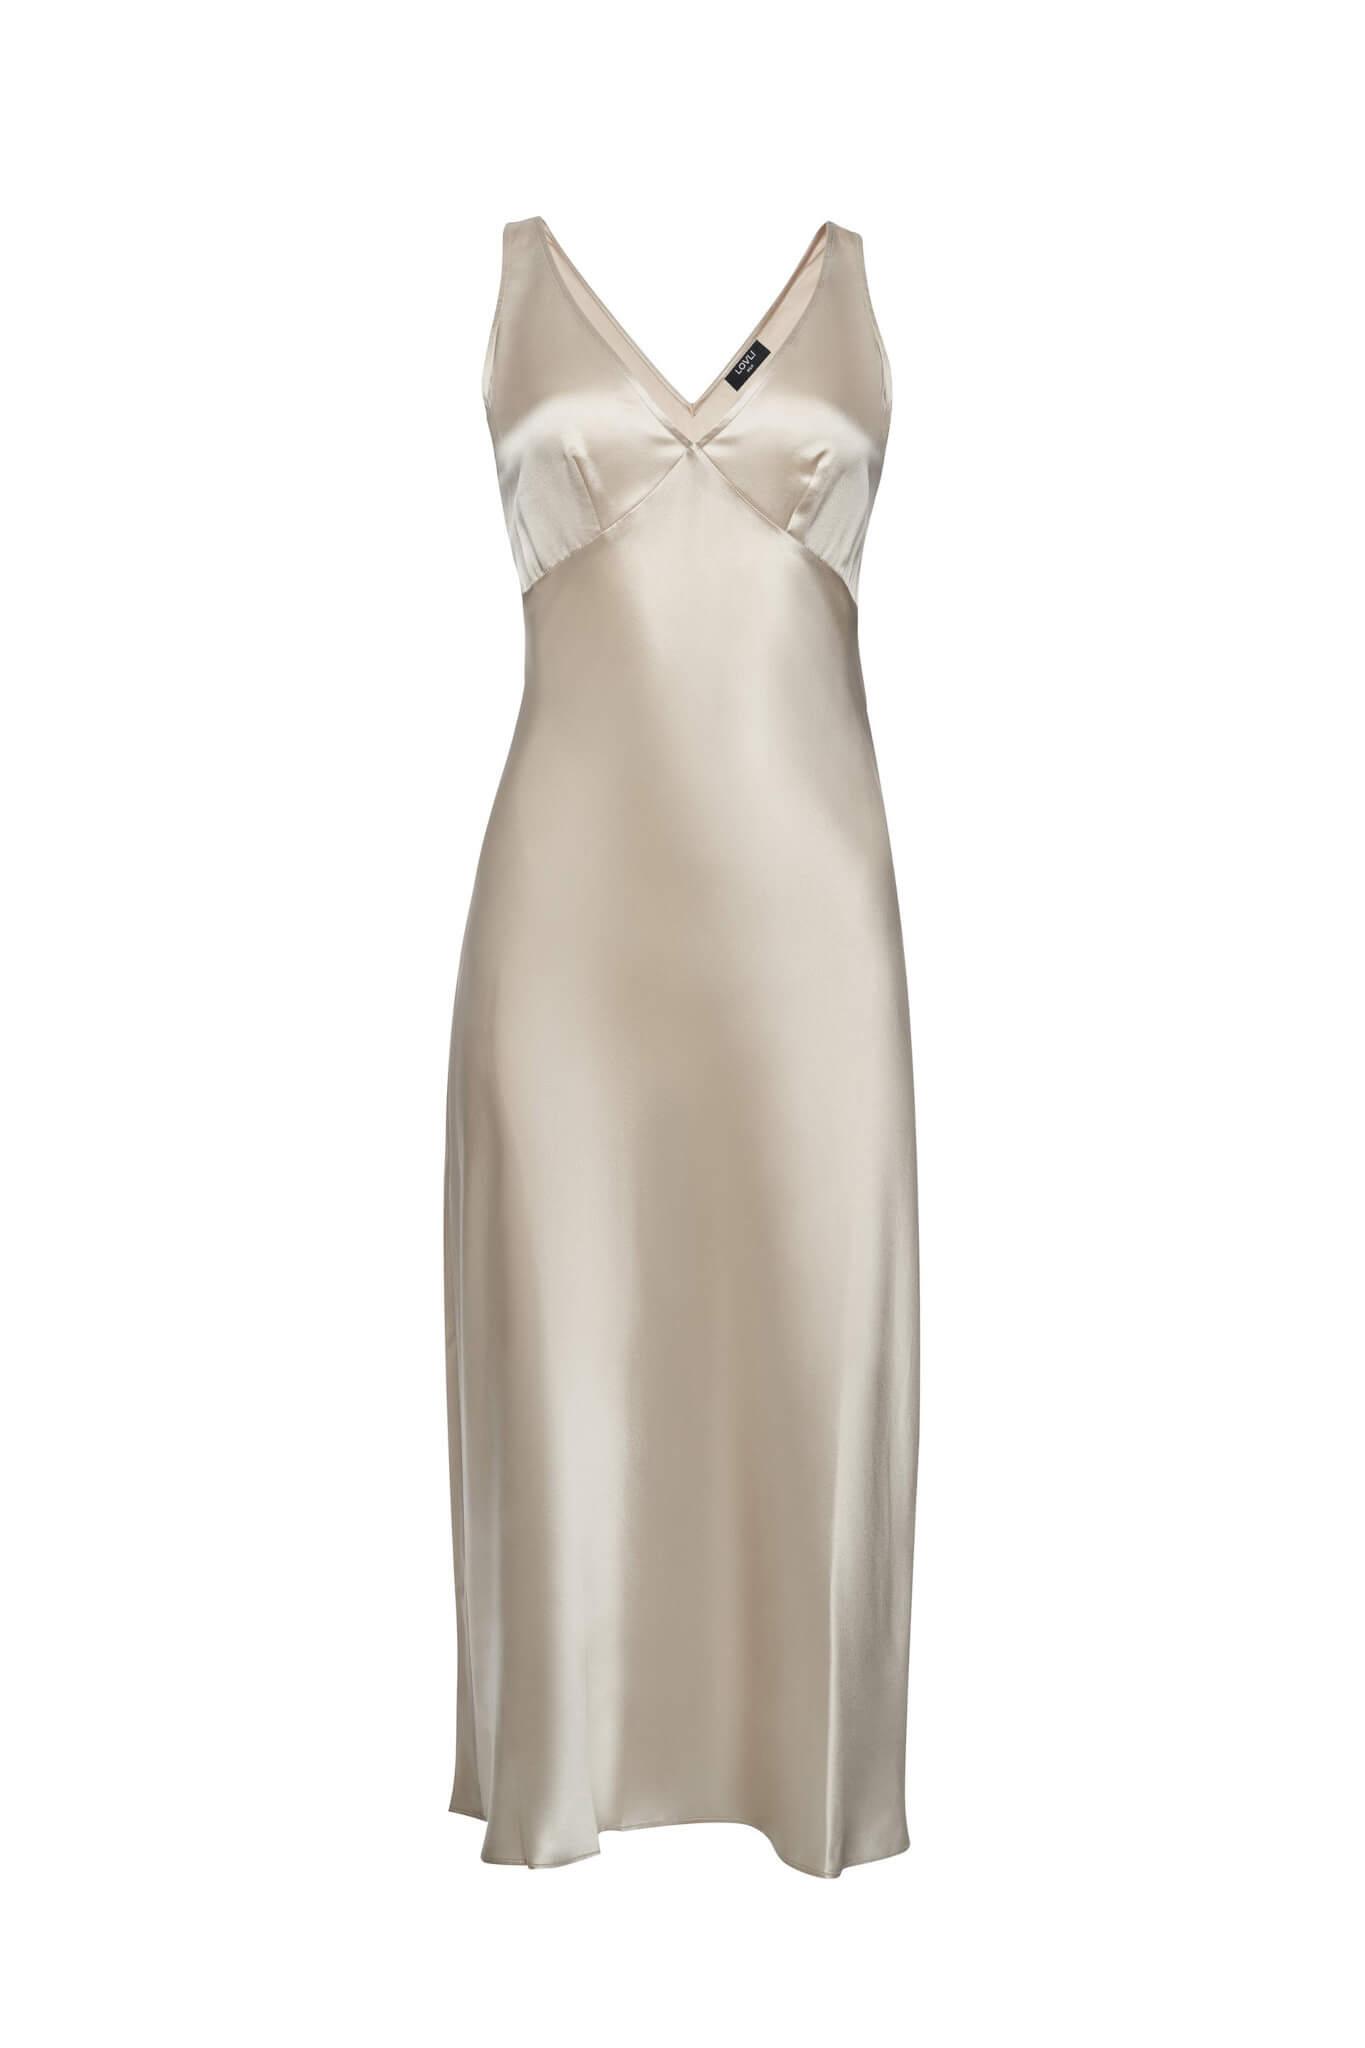 Silk Midi Dress in champagne